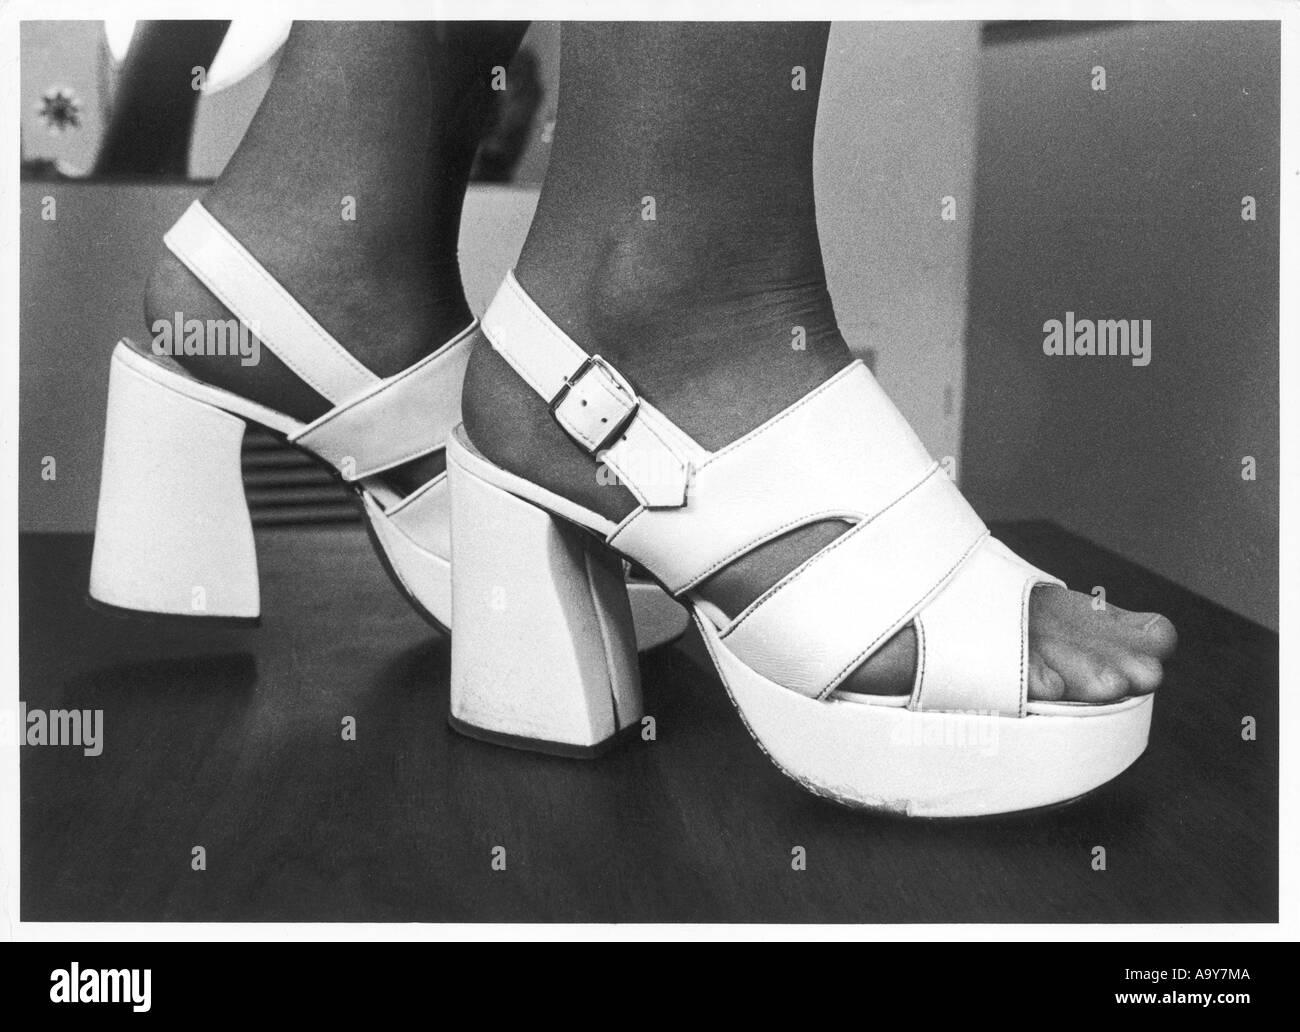 05d2bdb7f746 Platform Shoes 1970s Stock Photos   Platform Shoes 1970s Stock ...